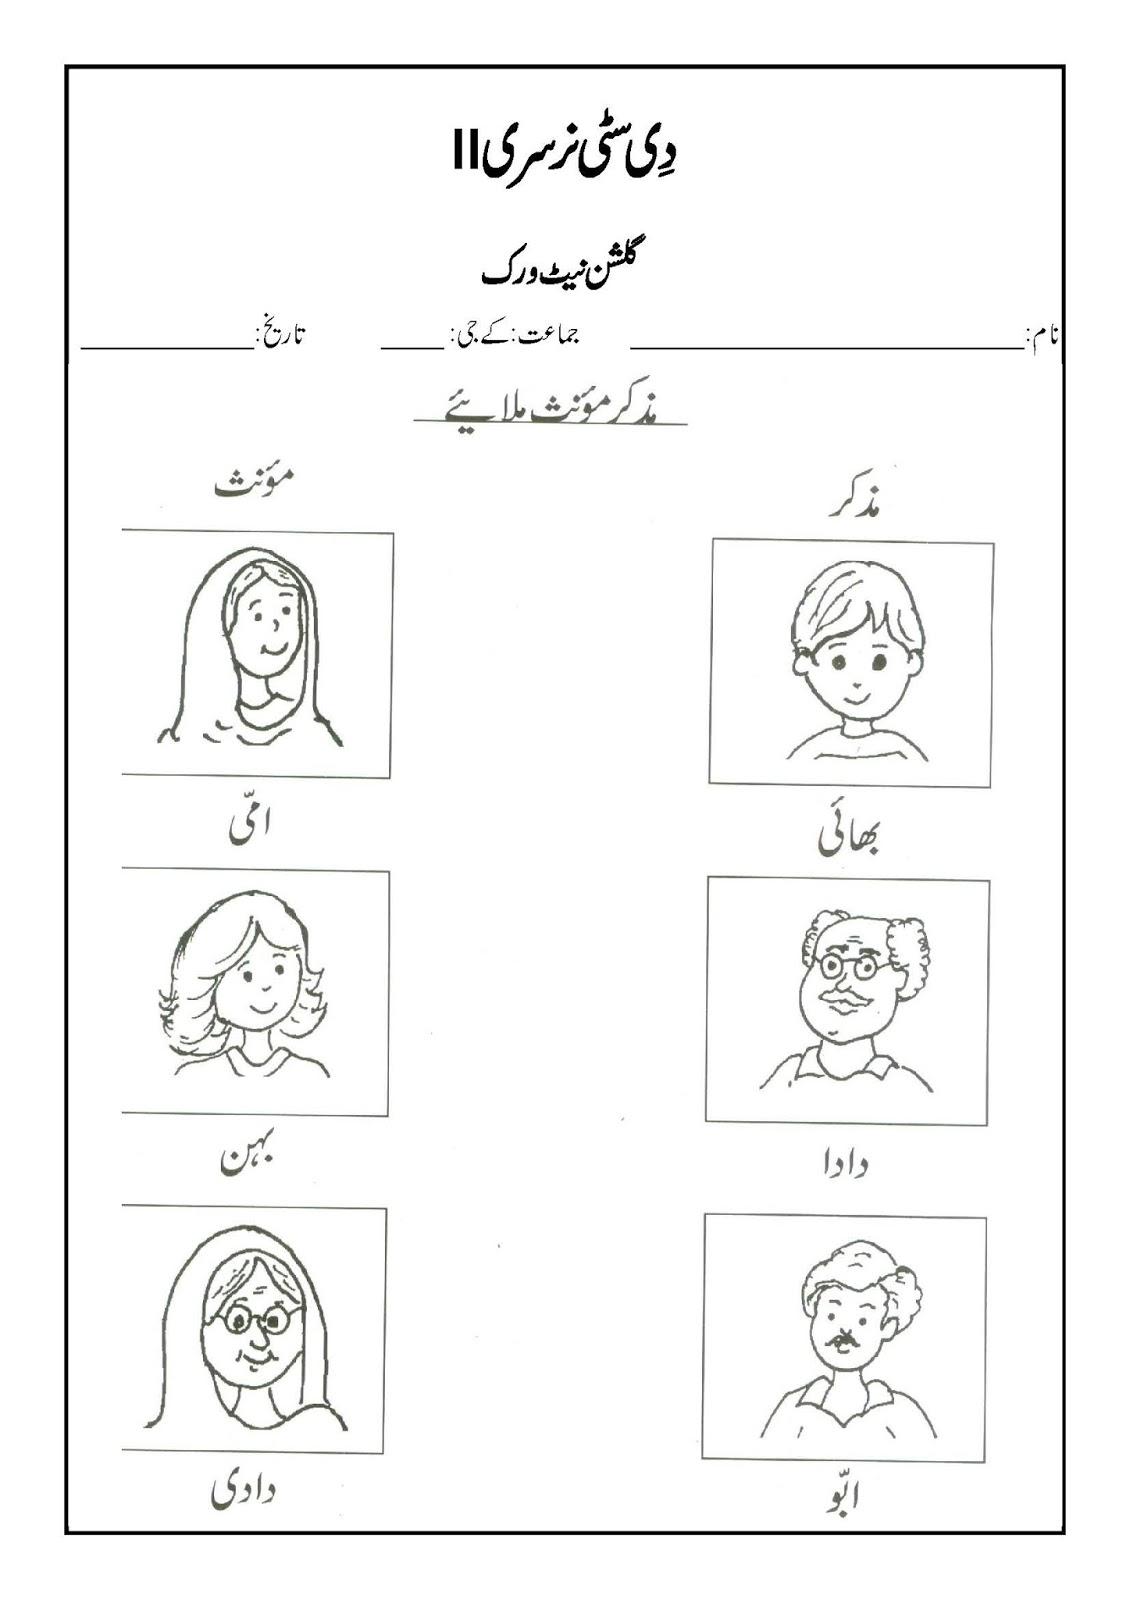 SR Gulshan The City Nursery-II: Urdu, Math & English Worksheets